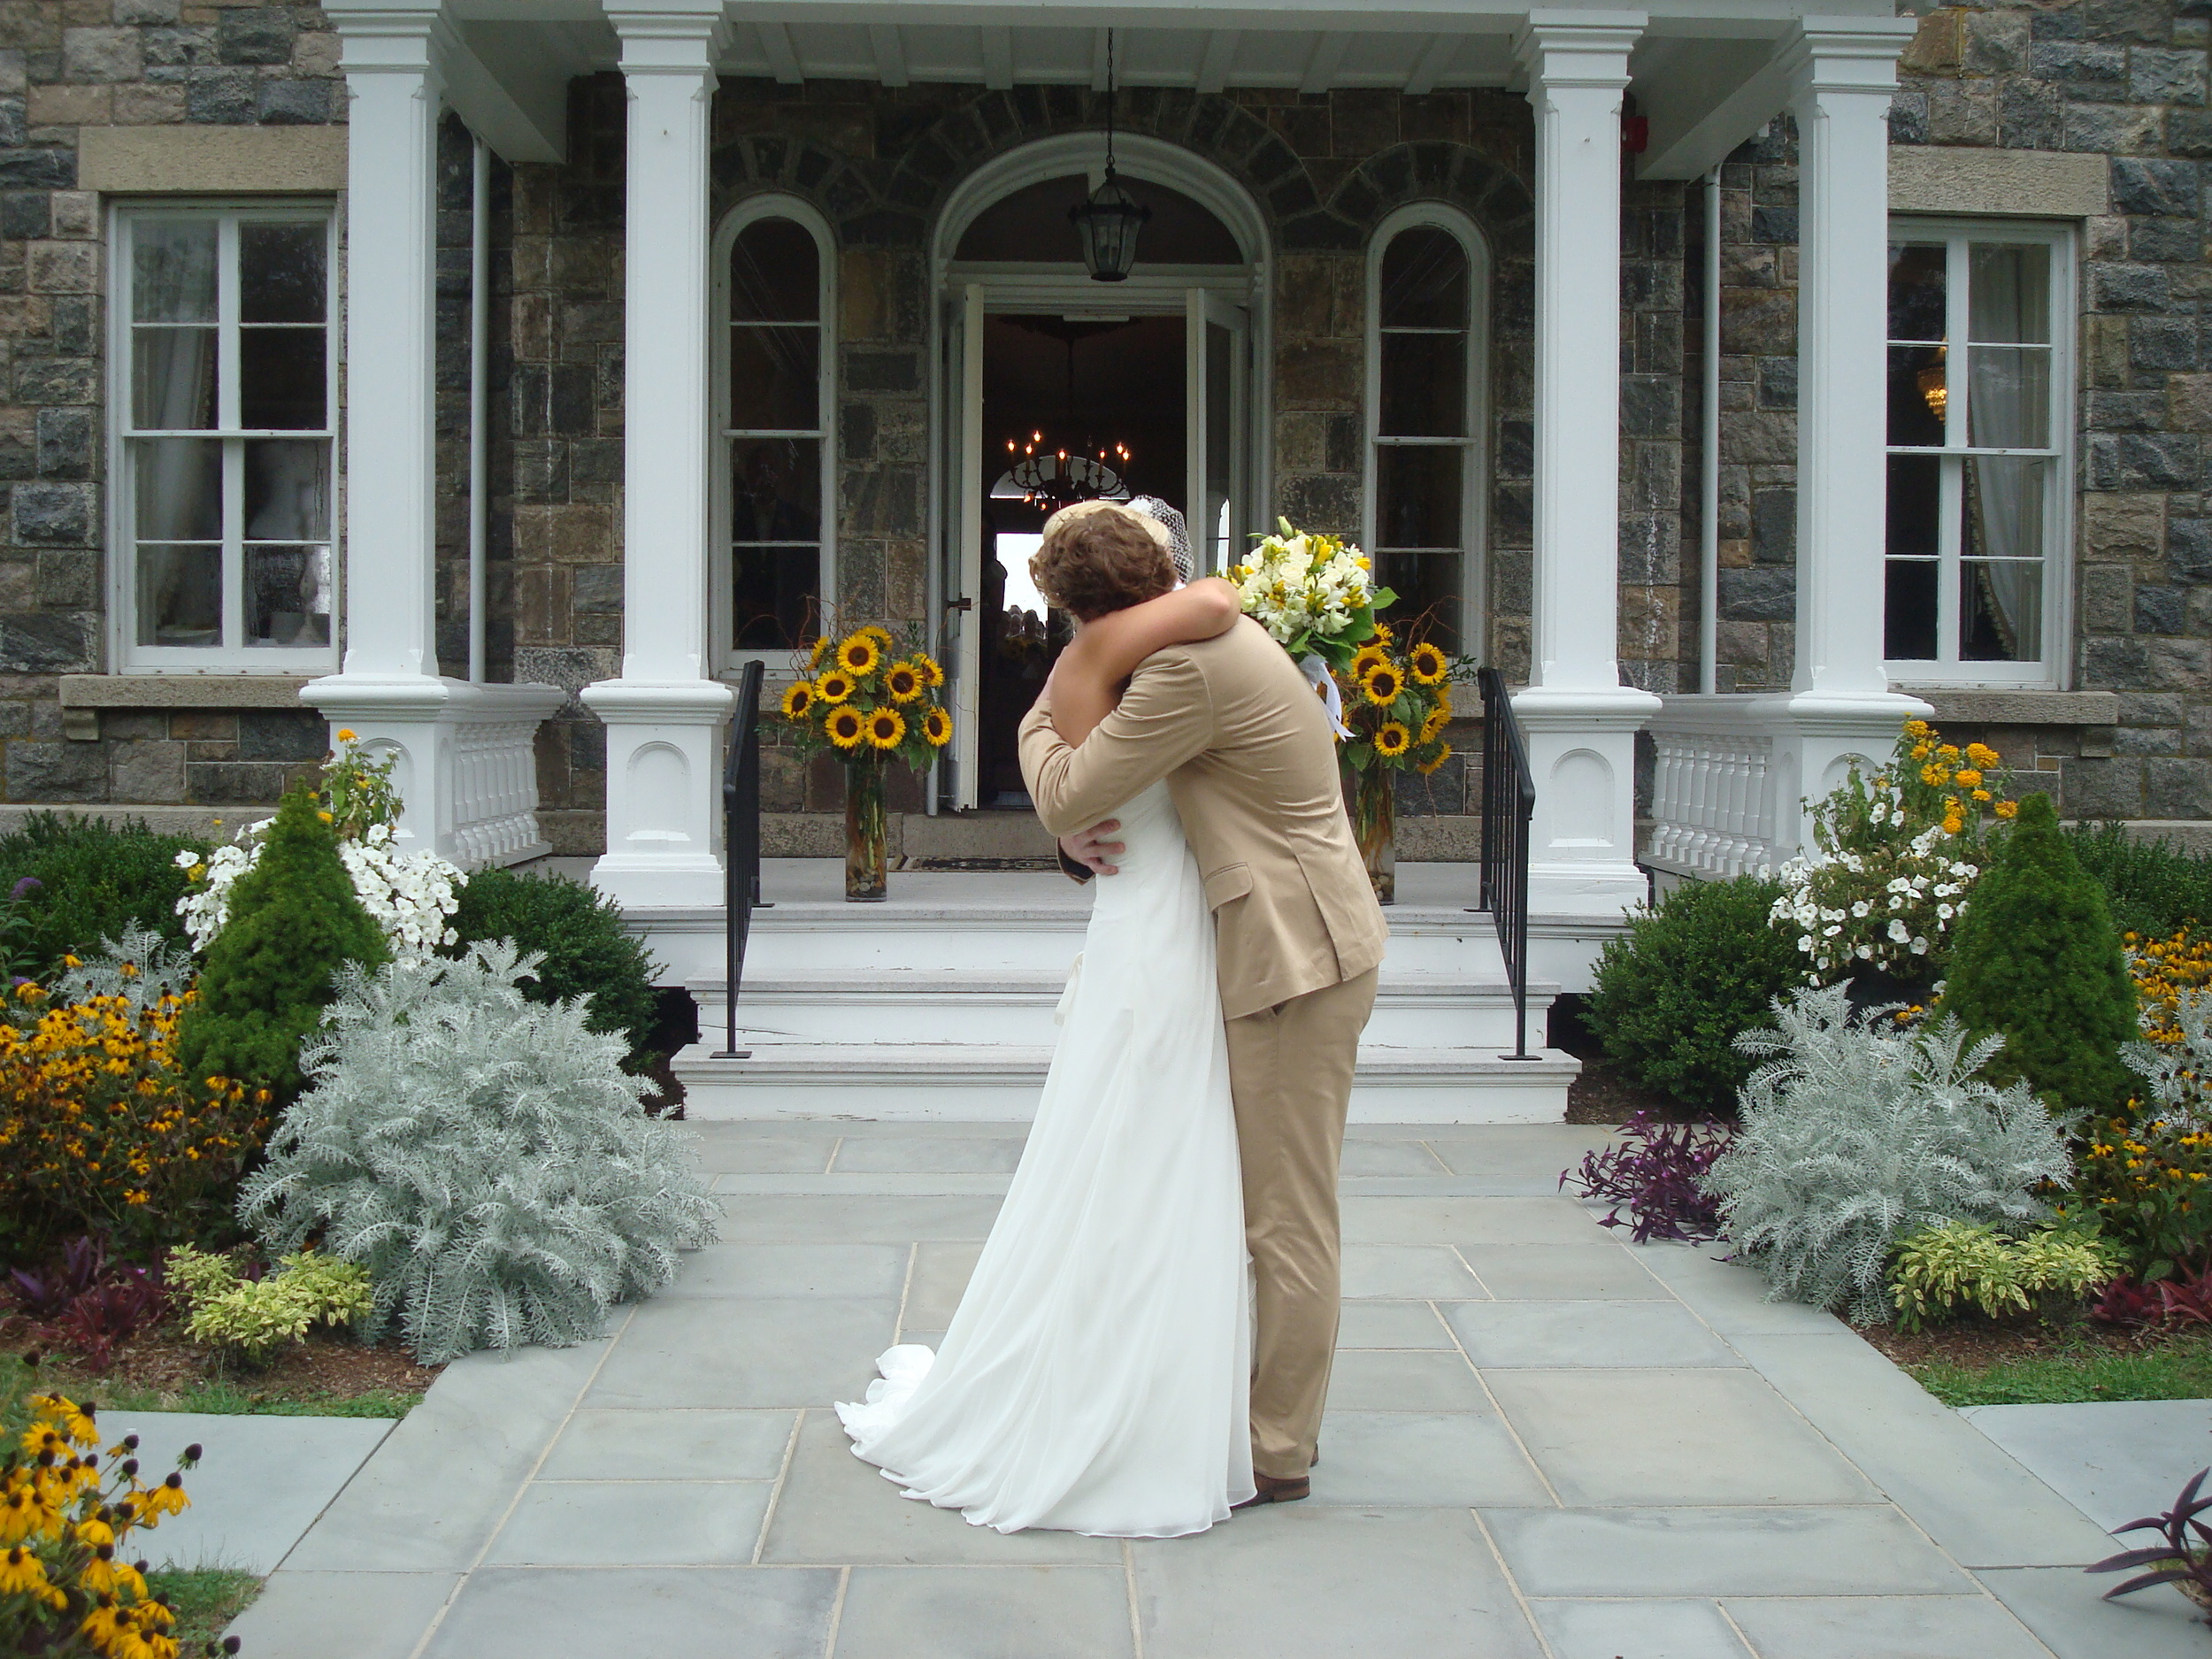 Petrie wedding 8-27-11 024.jpg